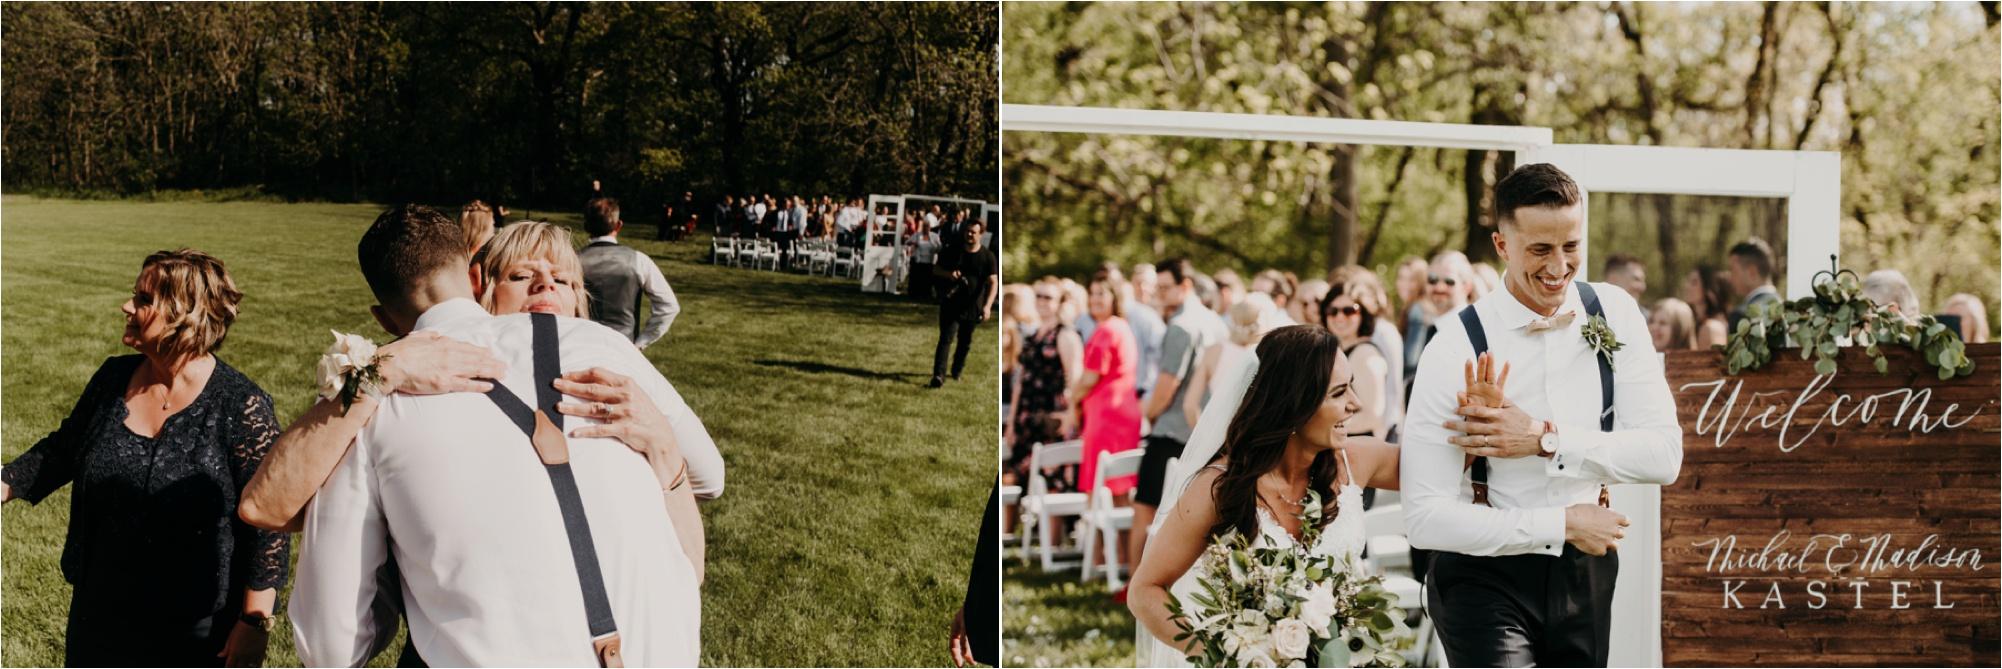 The Barn and Black Ridge Wedding Minneapolis Wedding Photographer_4157.jpg